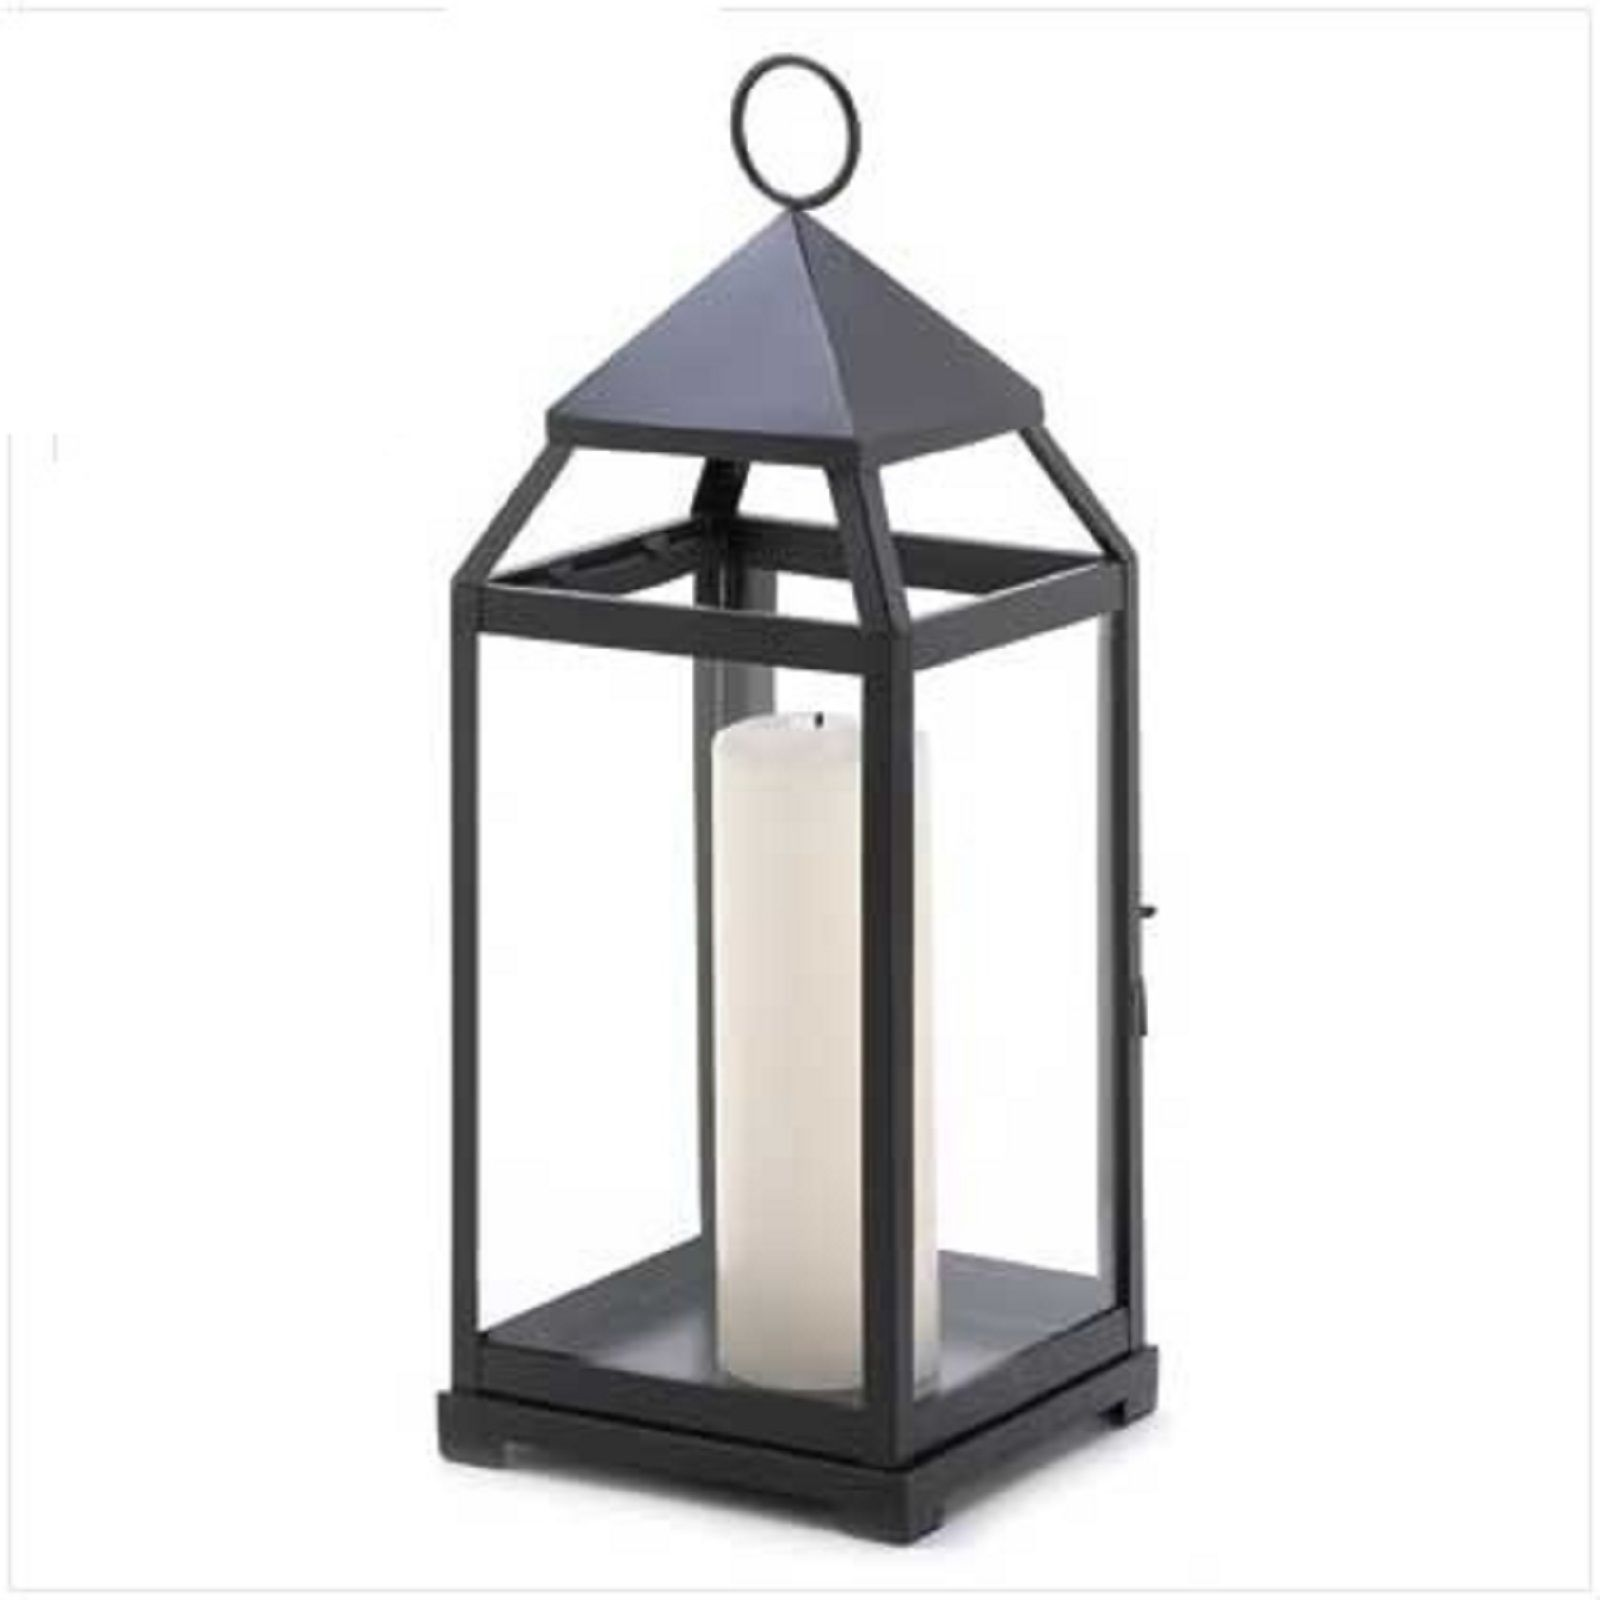 20 Black Lantern Candleholder Wedding Centerpieces